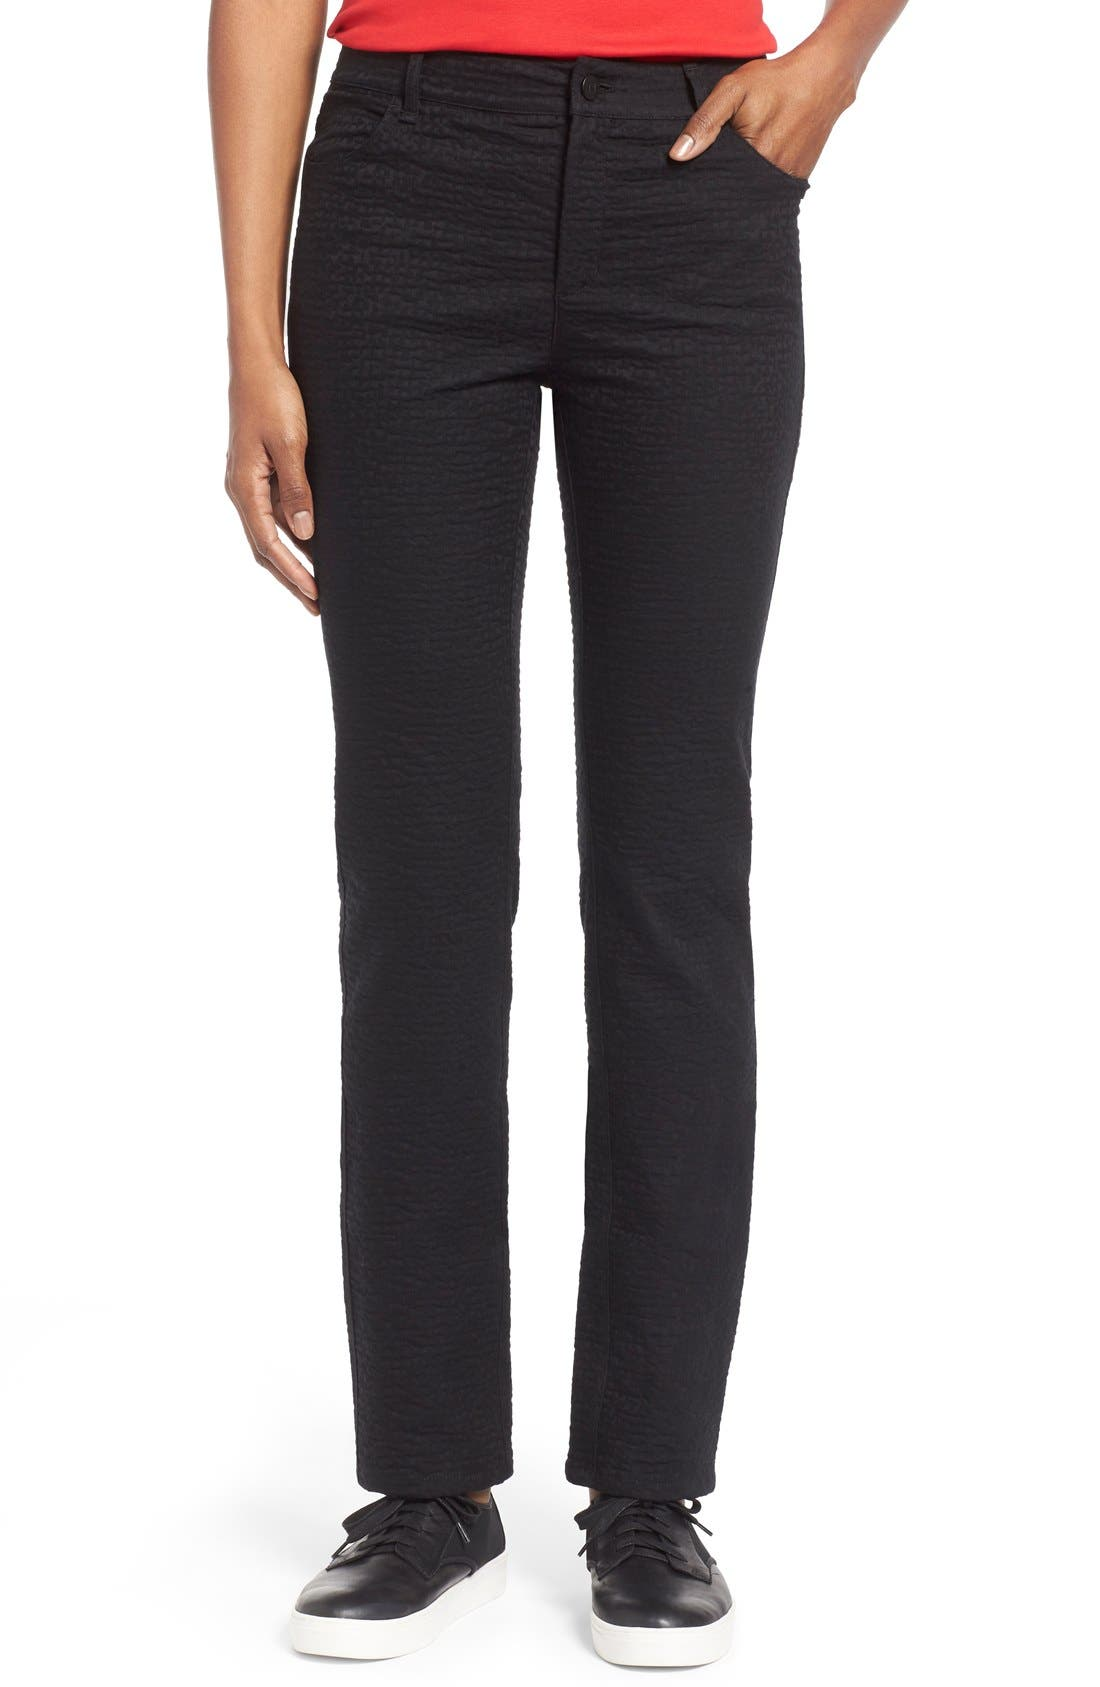 Curvy Fit Jacquard Stretch Slim Leg Jeans,                         Main,                         color, Black